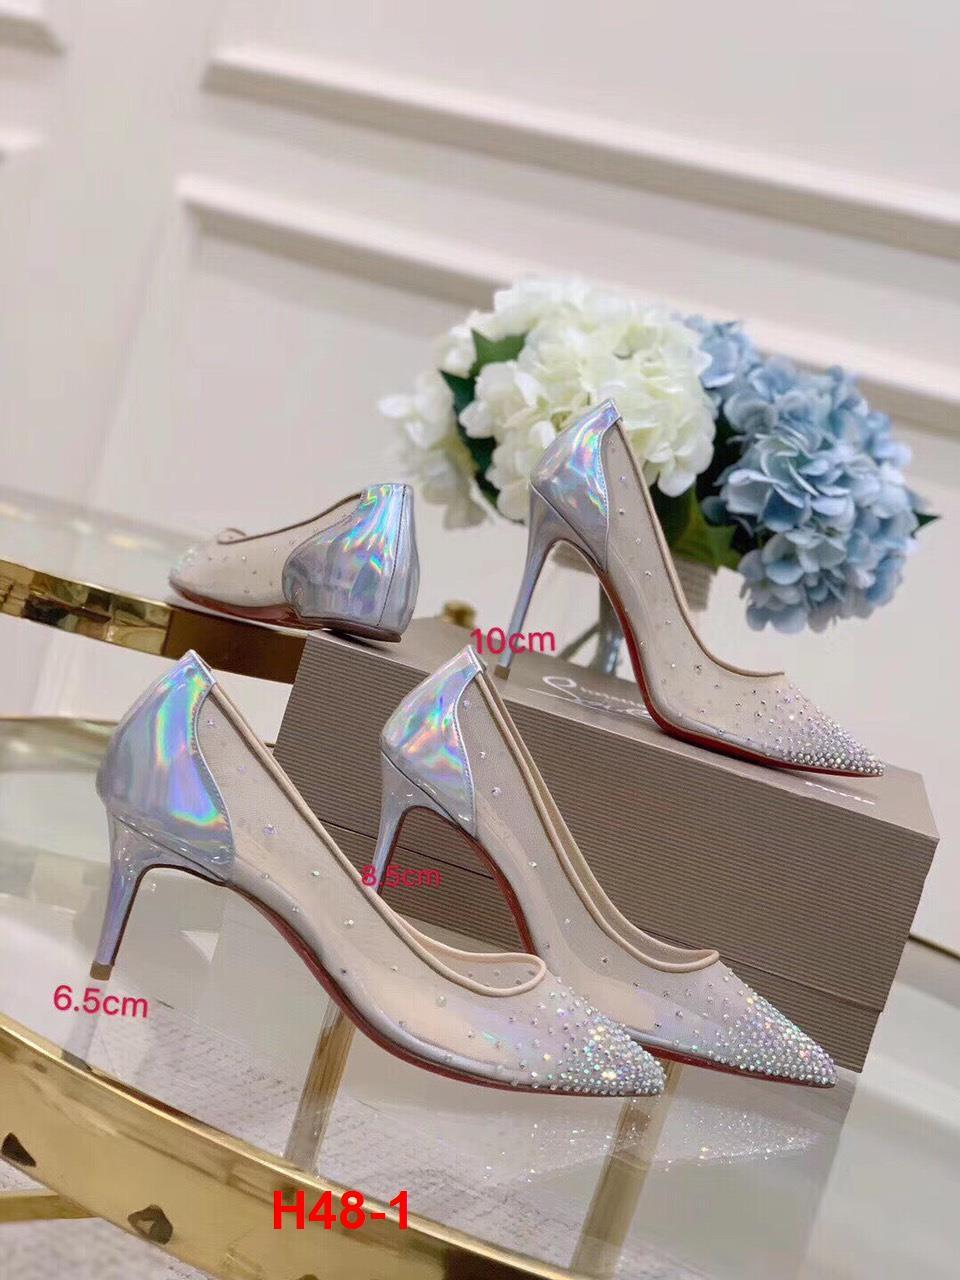 H48-1 Louboutin giày cao 2cm, 6cm, 8cm, 10cm siêu cấp